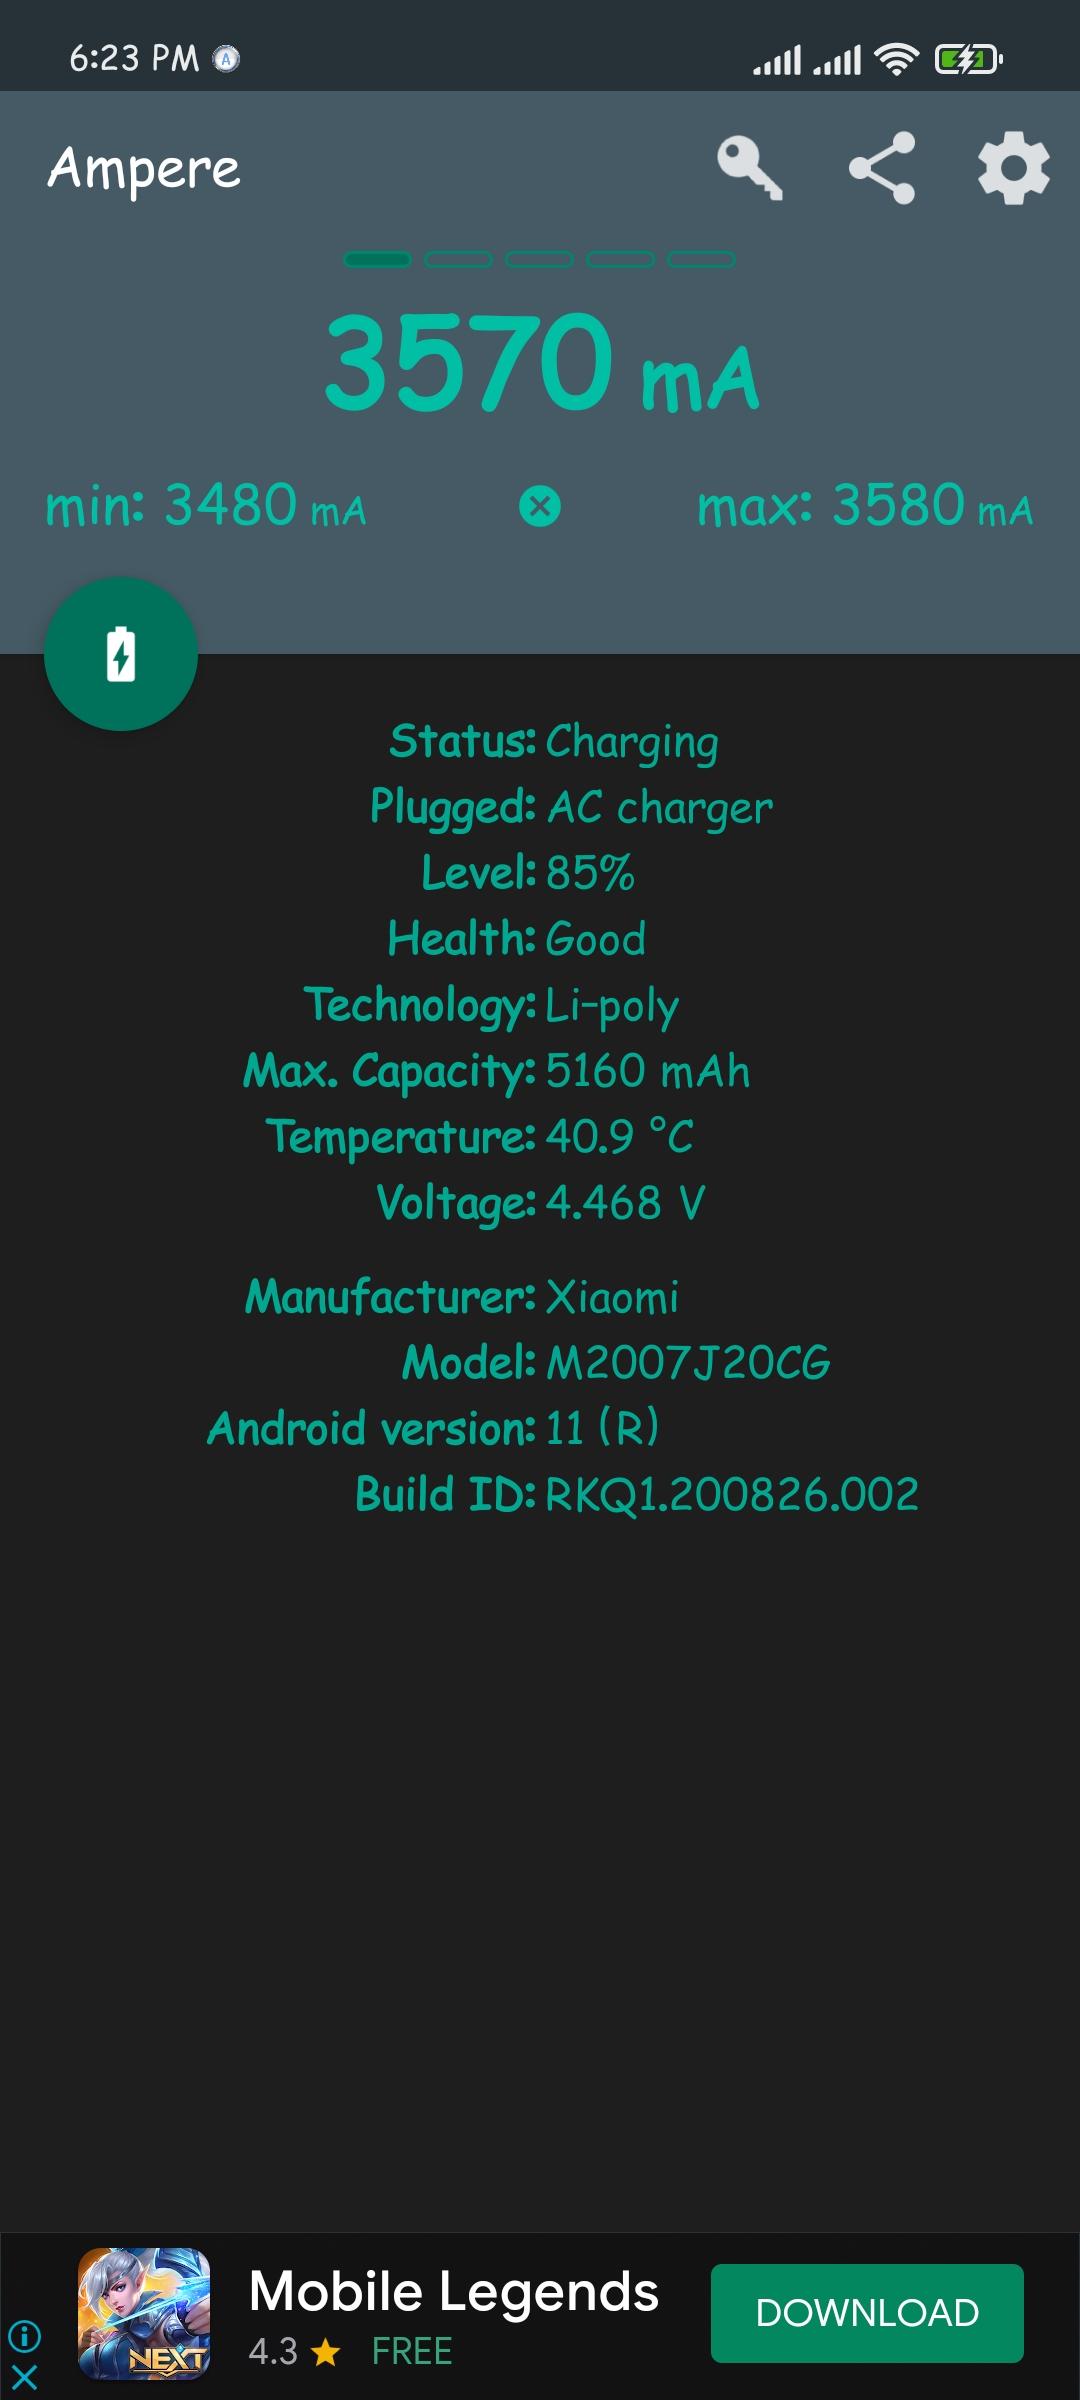 Screenshot_2021-07-28-18-23-21-432_com.gombosdev.ampere.jpg